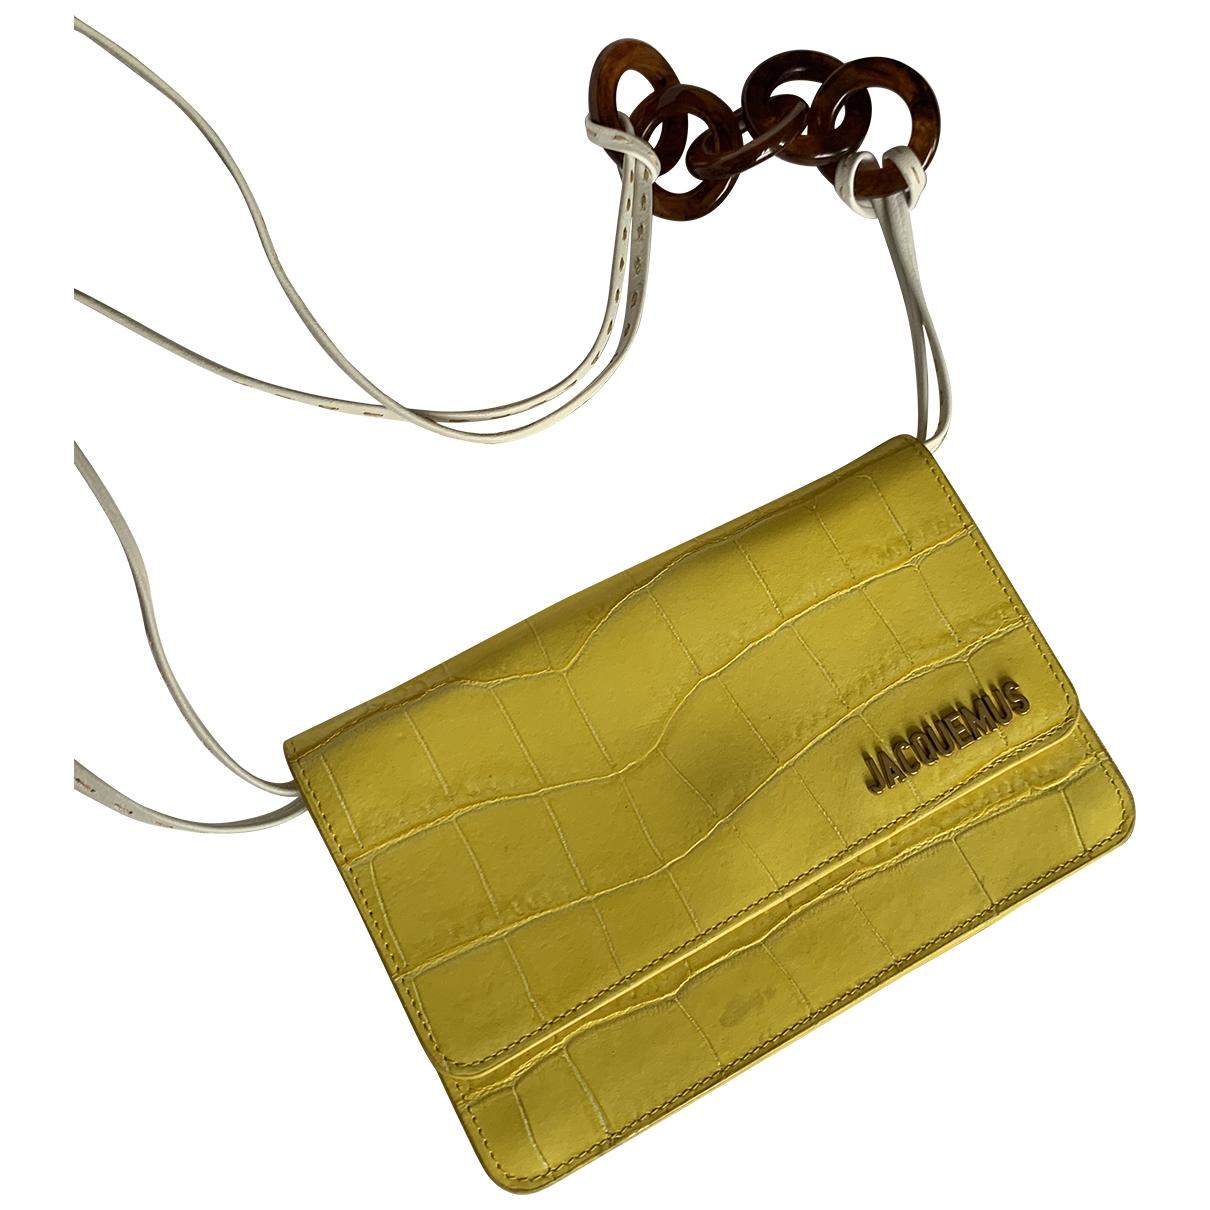 Jacquemus Le Riviera Handtasche in  Gelb Leder